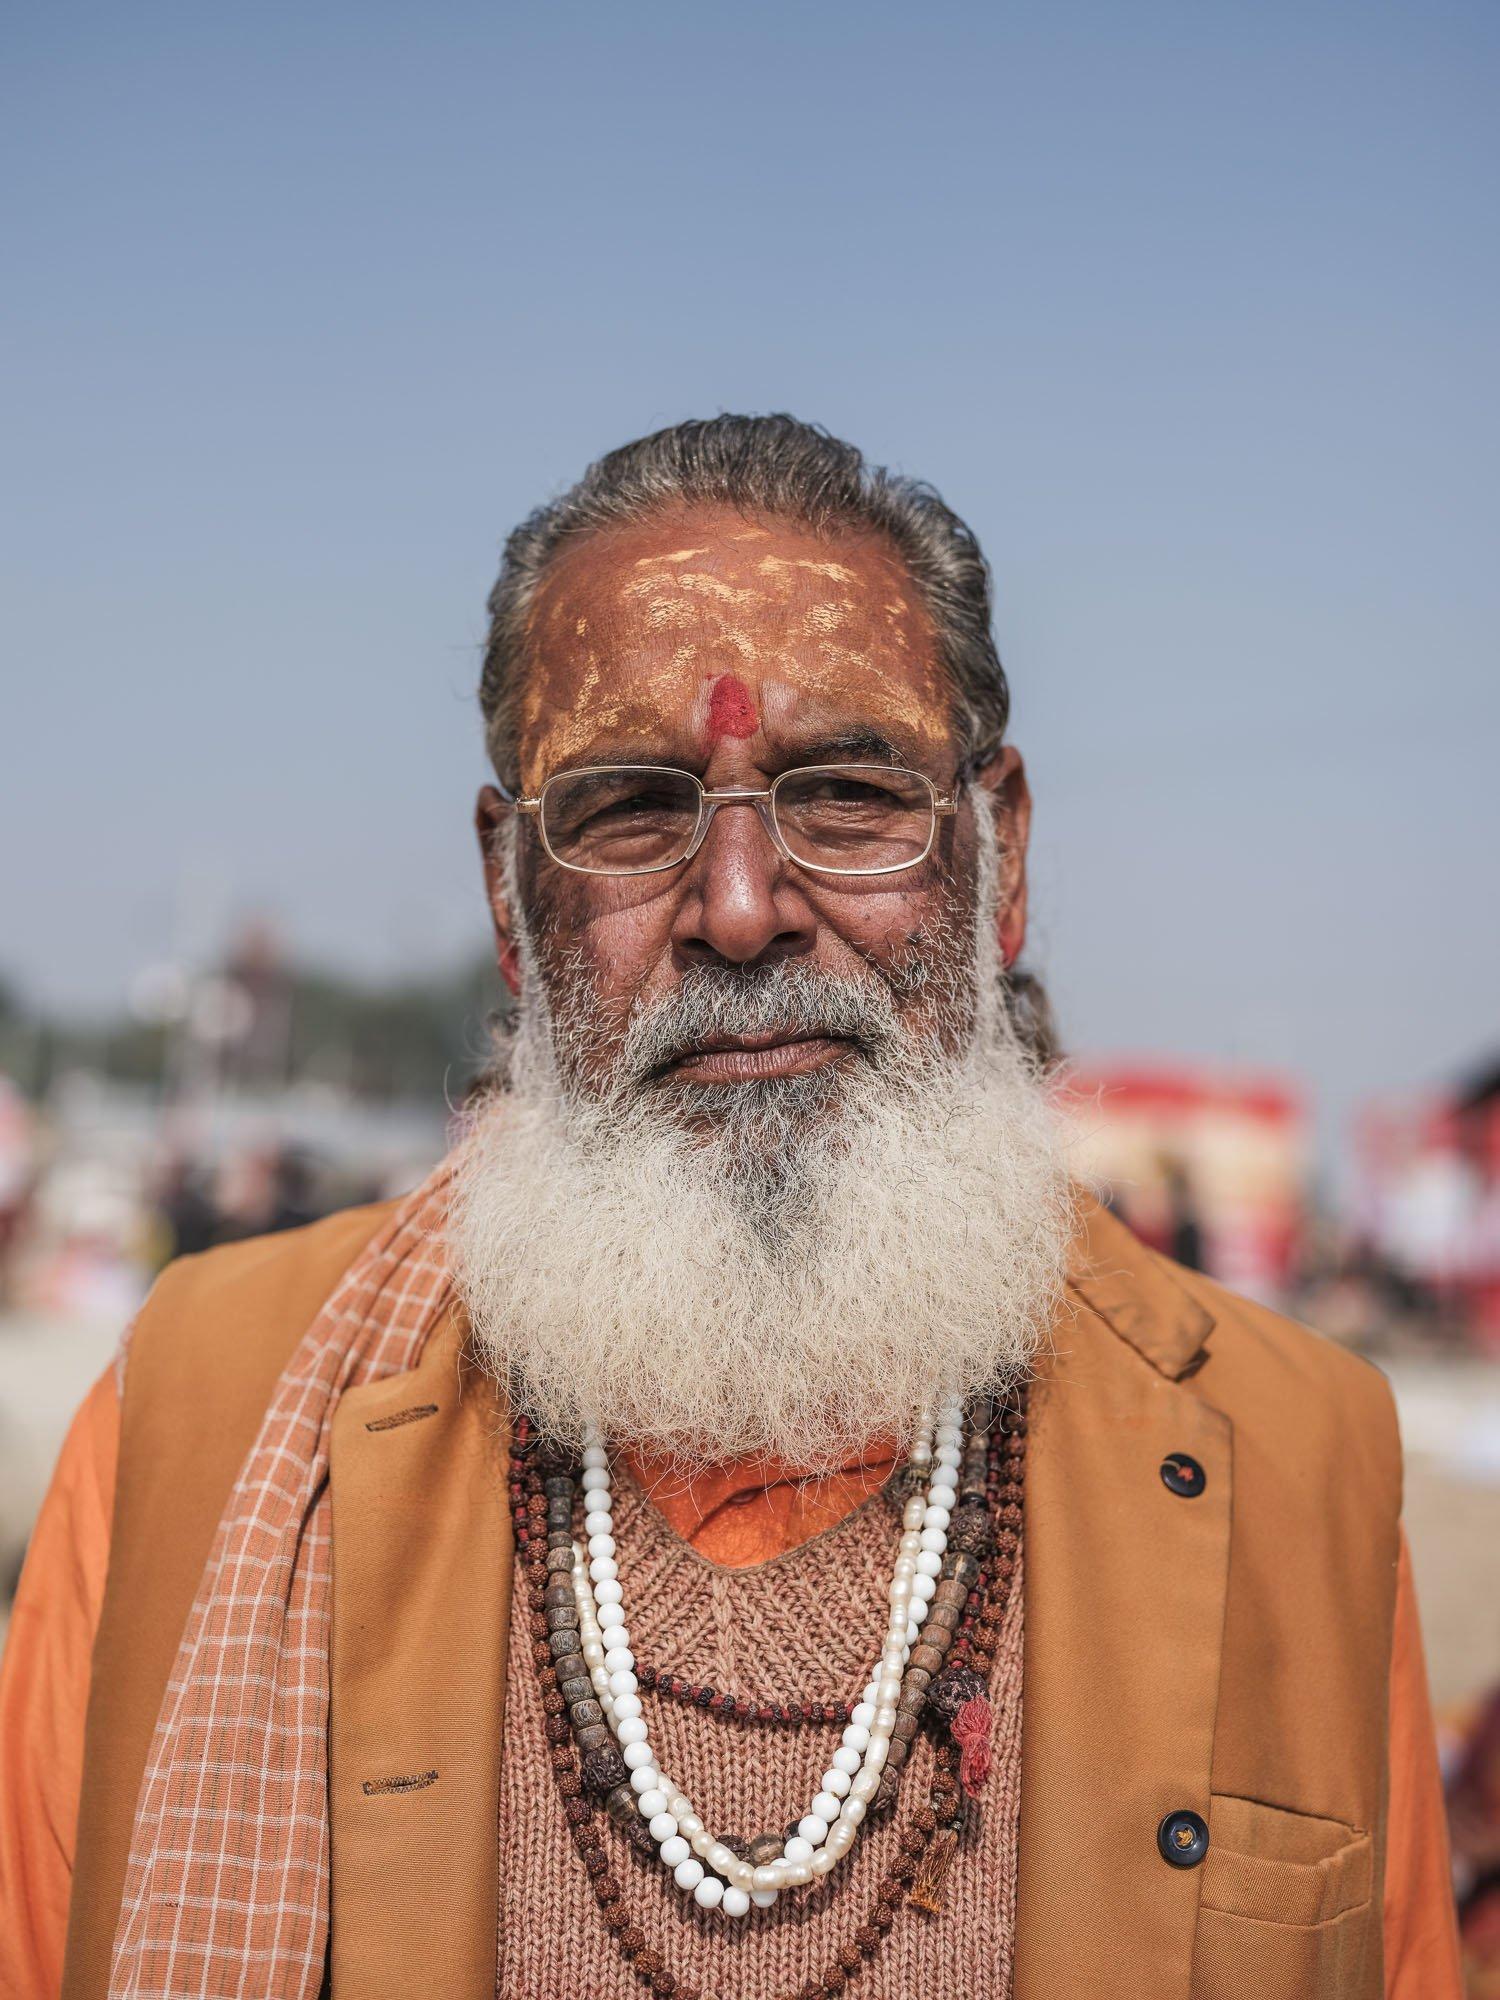 india man Kumbh mela orange beard Commercial Editorial Portraiture Documentary Photographer fujifilm Director Singapore Jose Jeuland photography fashion street hindu